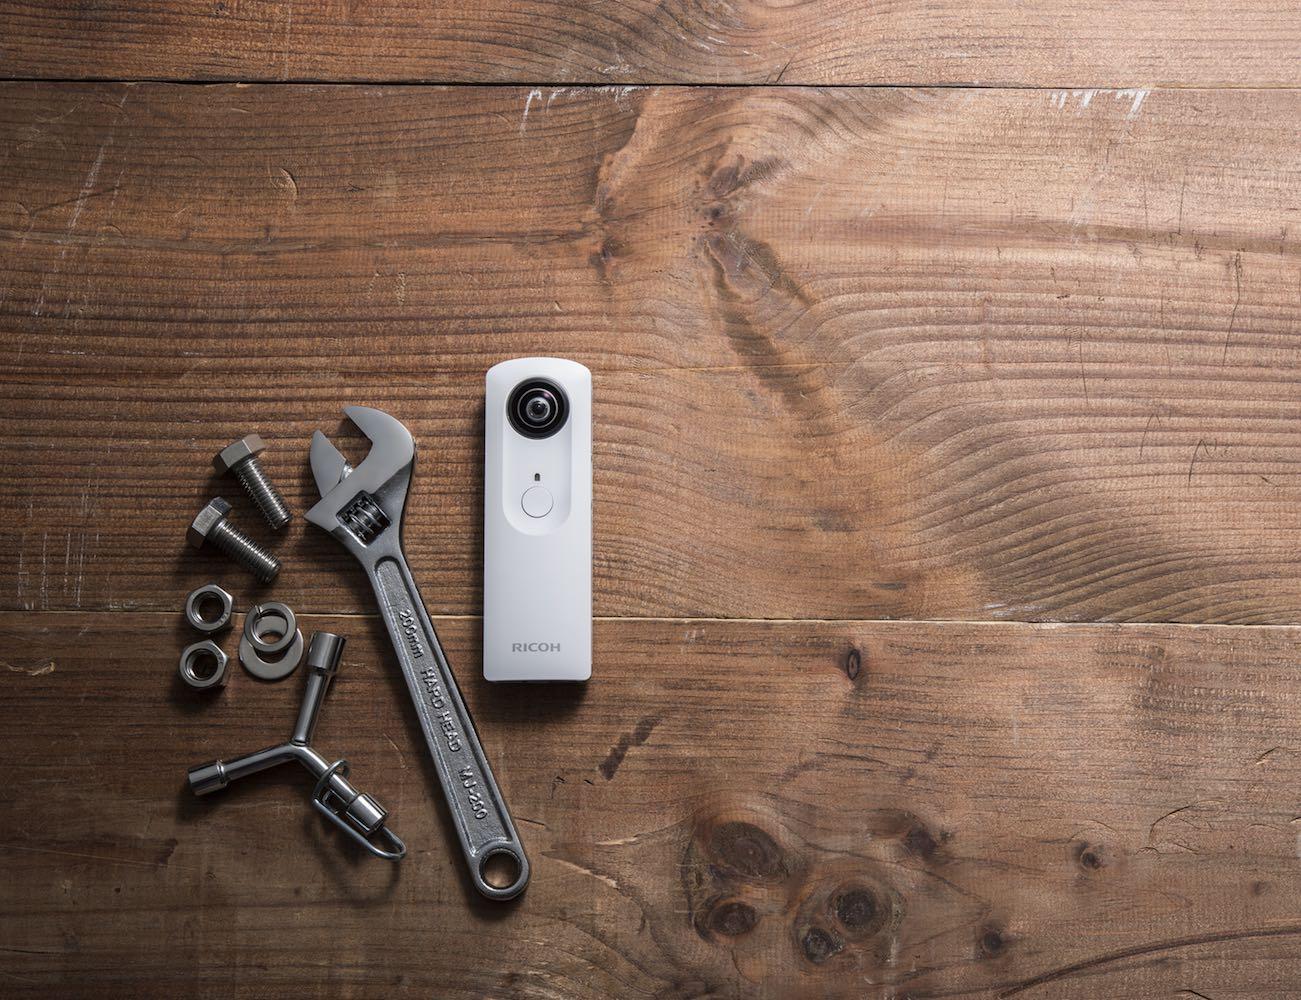 Ricoh Theta S - 360-Degree Spherical Digital Camera